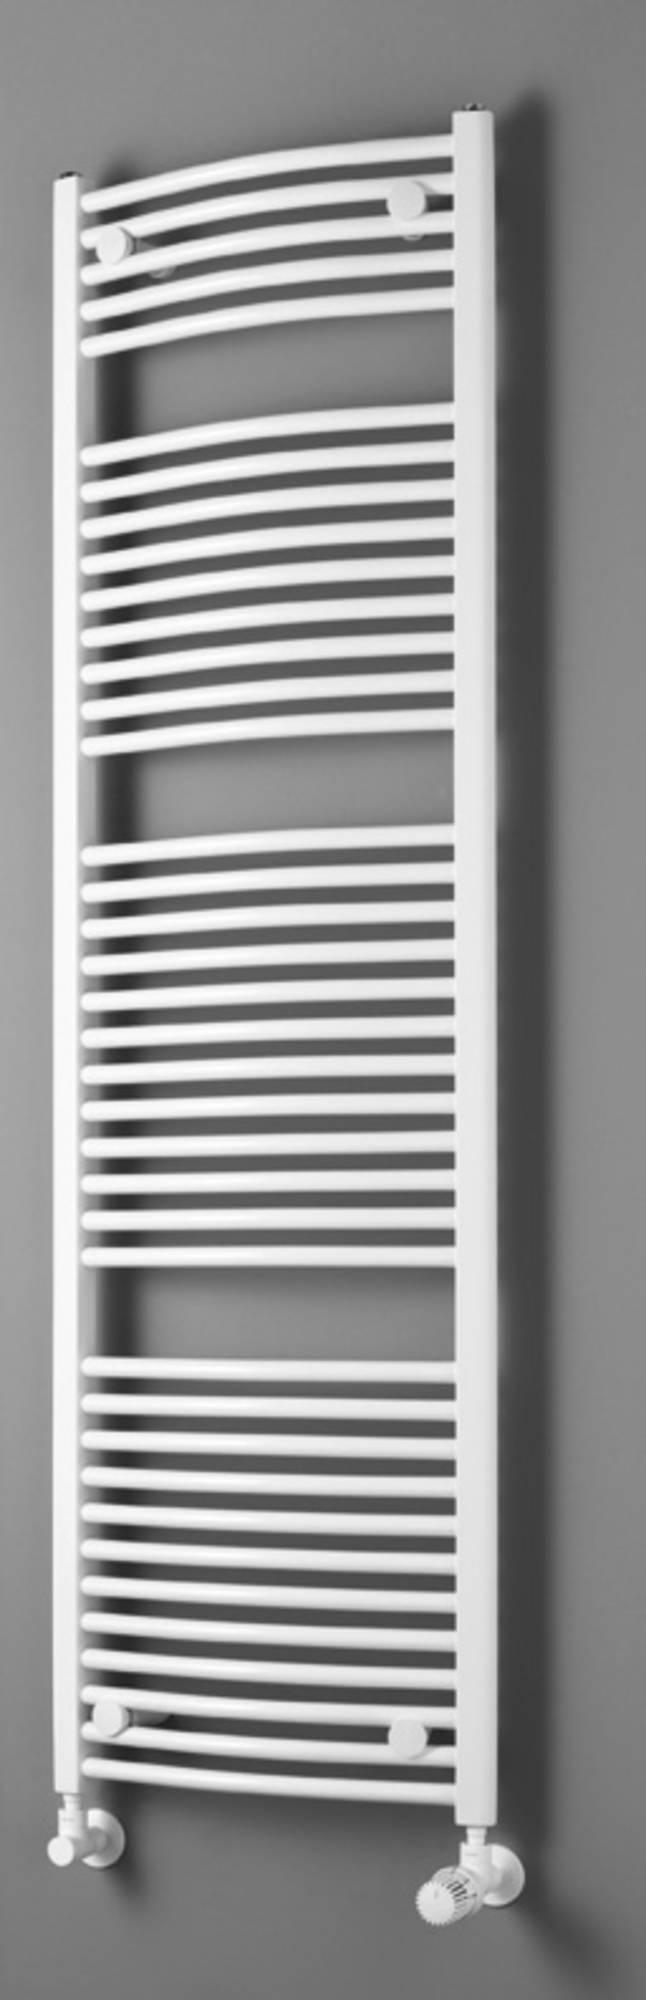 Ben Samos Designradiator 50x121,5cm 645watt Wit